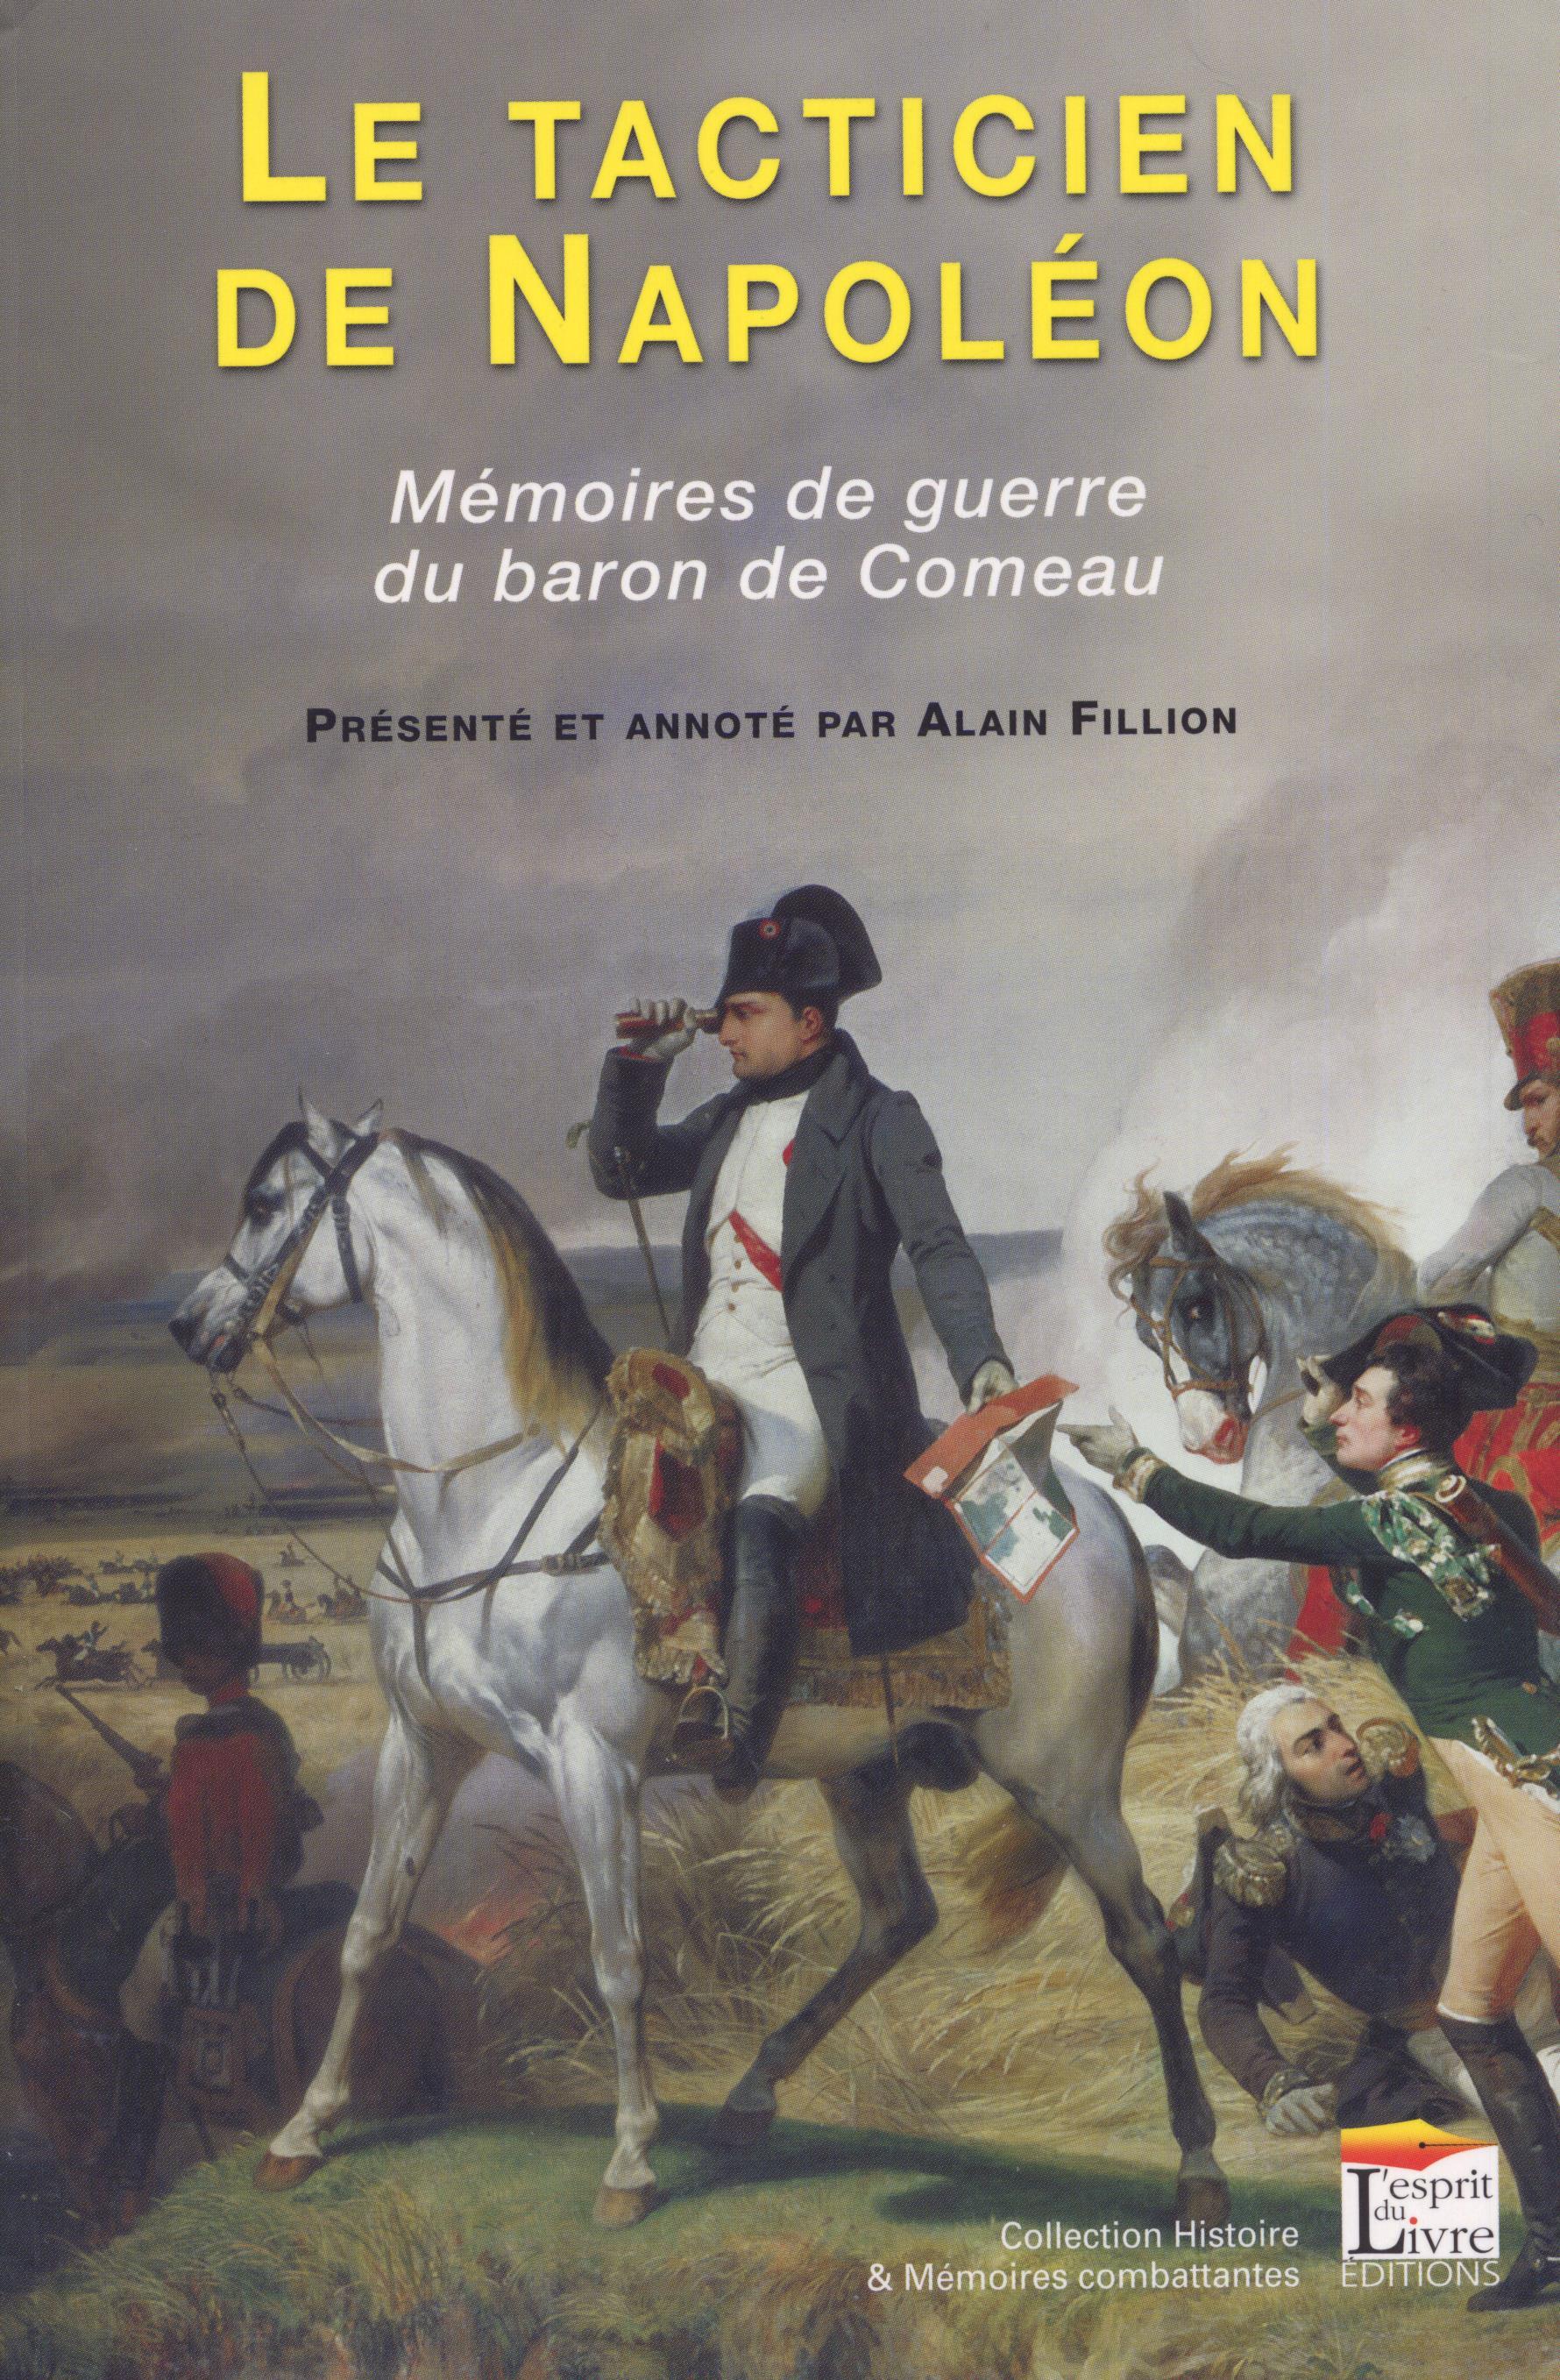 La tacticien de Napoléon 745452003